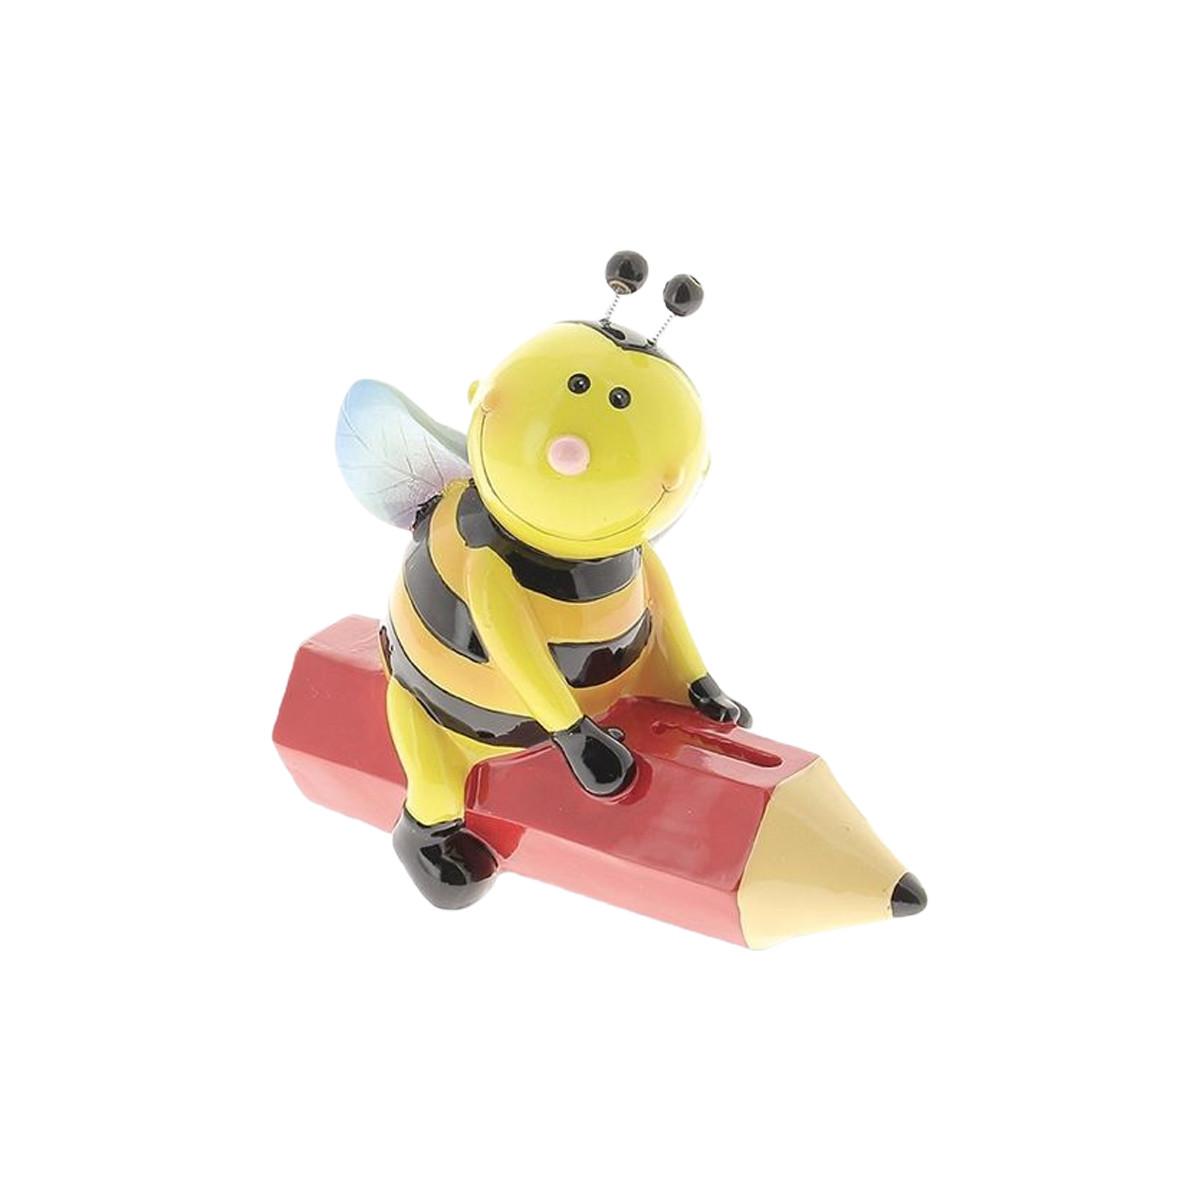 Tirelire abeille sur crayon